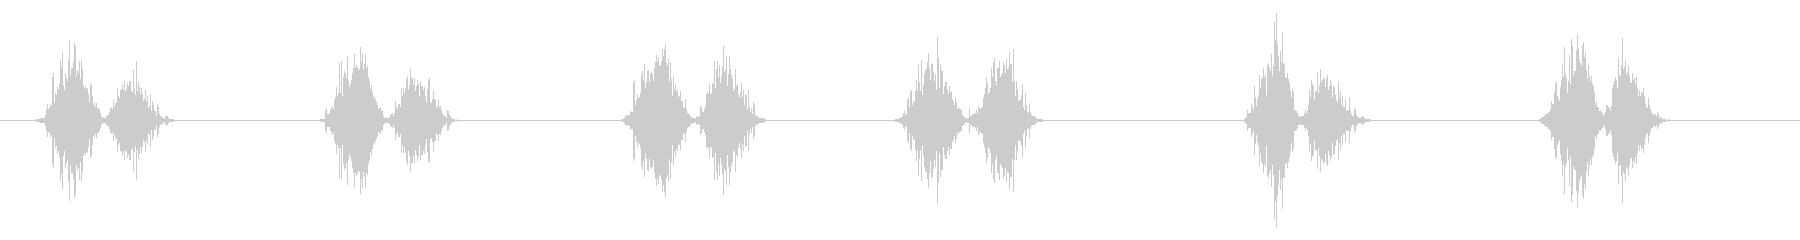 PC マウス ムーブ02-05(ハード)の未再生の波形